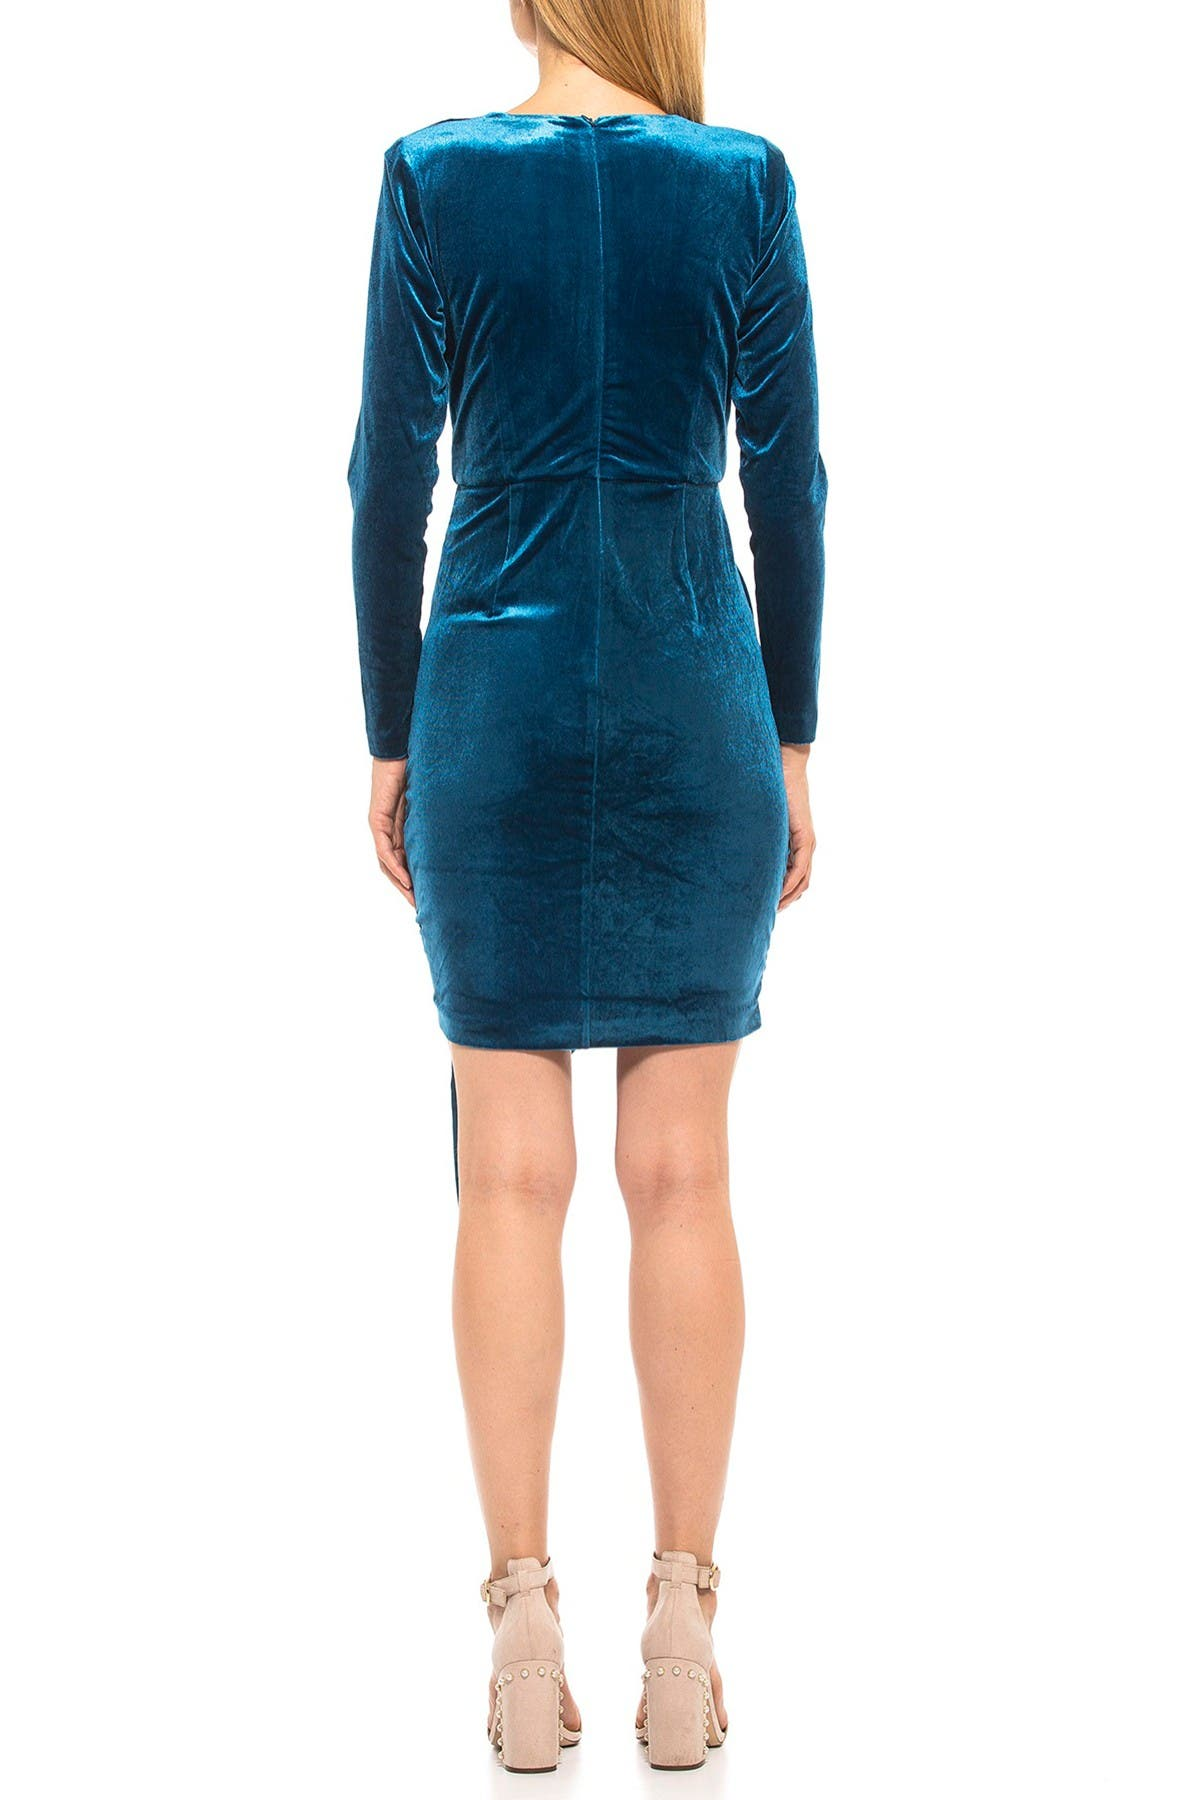 Image of Alexia Admor Juliana Draped Velvet Wrap Dress